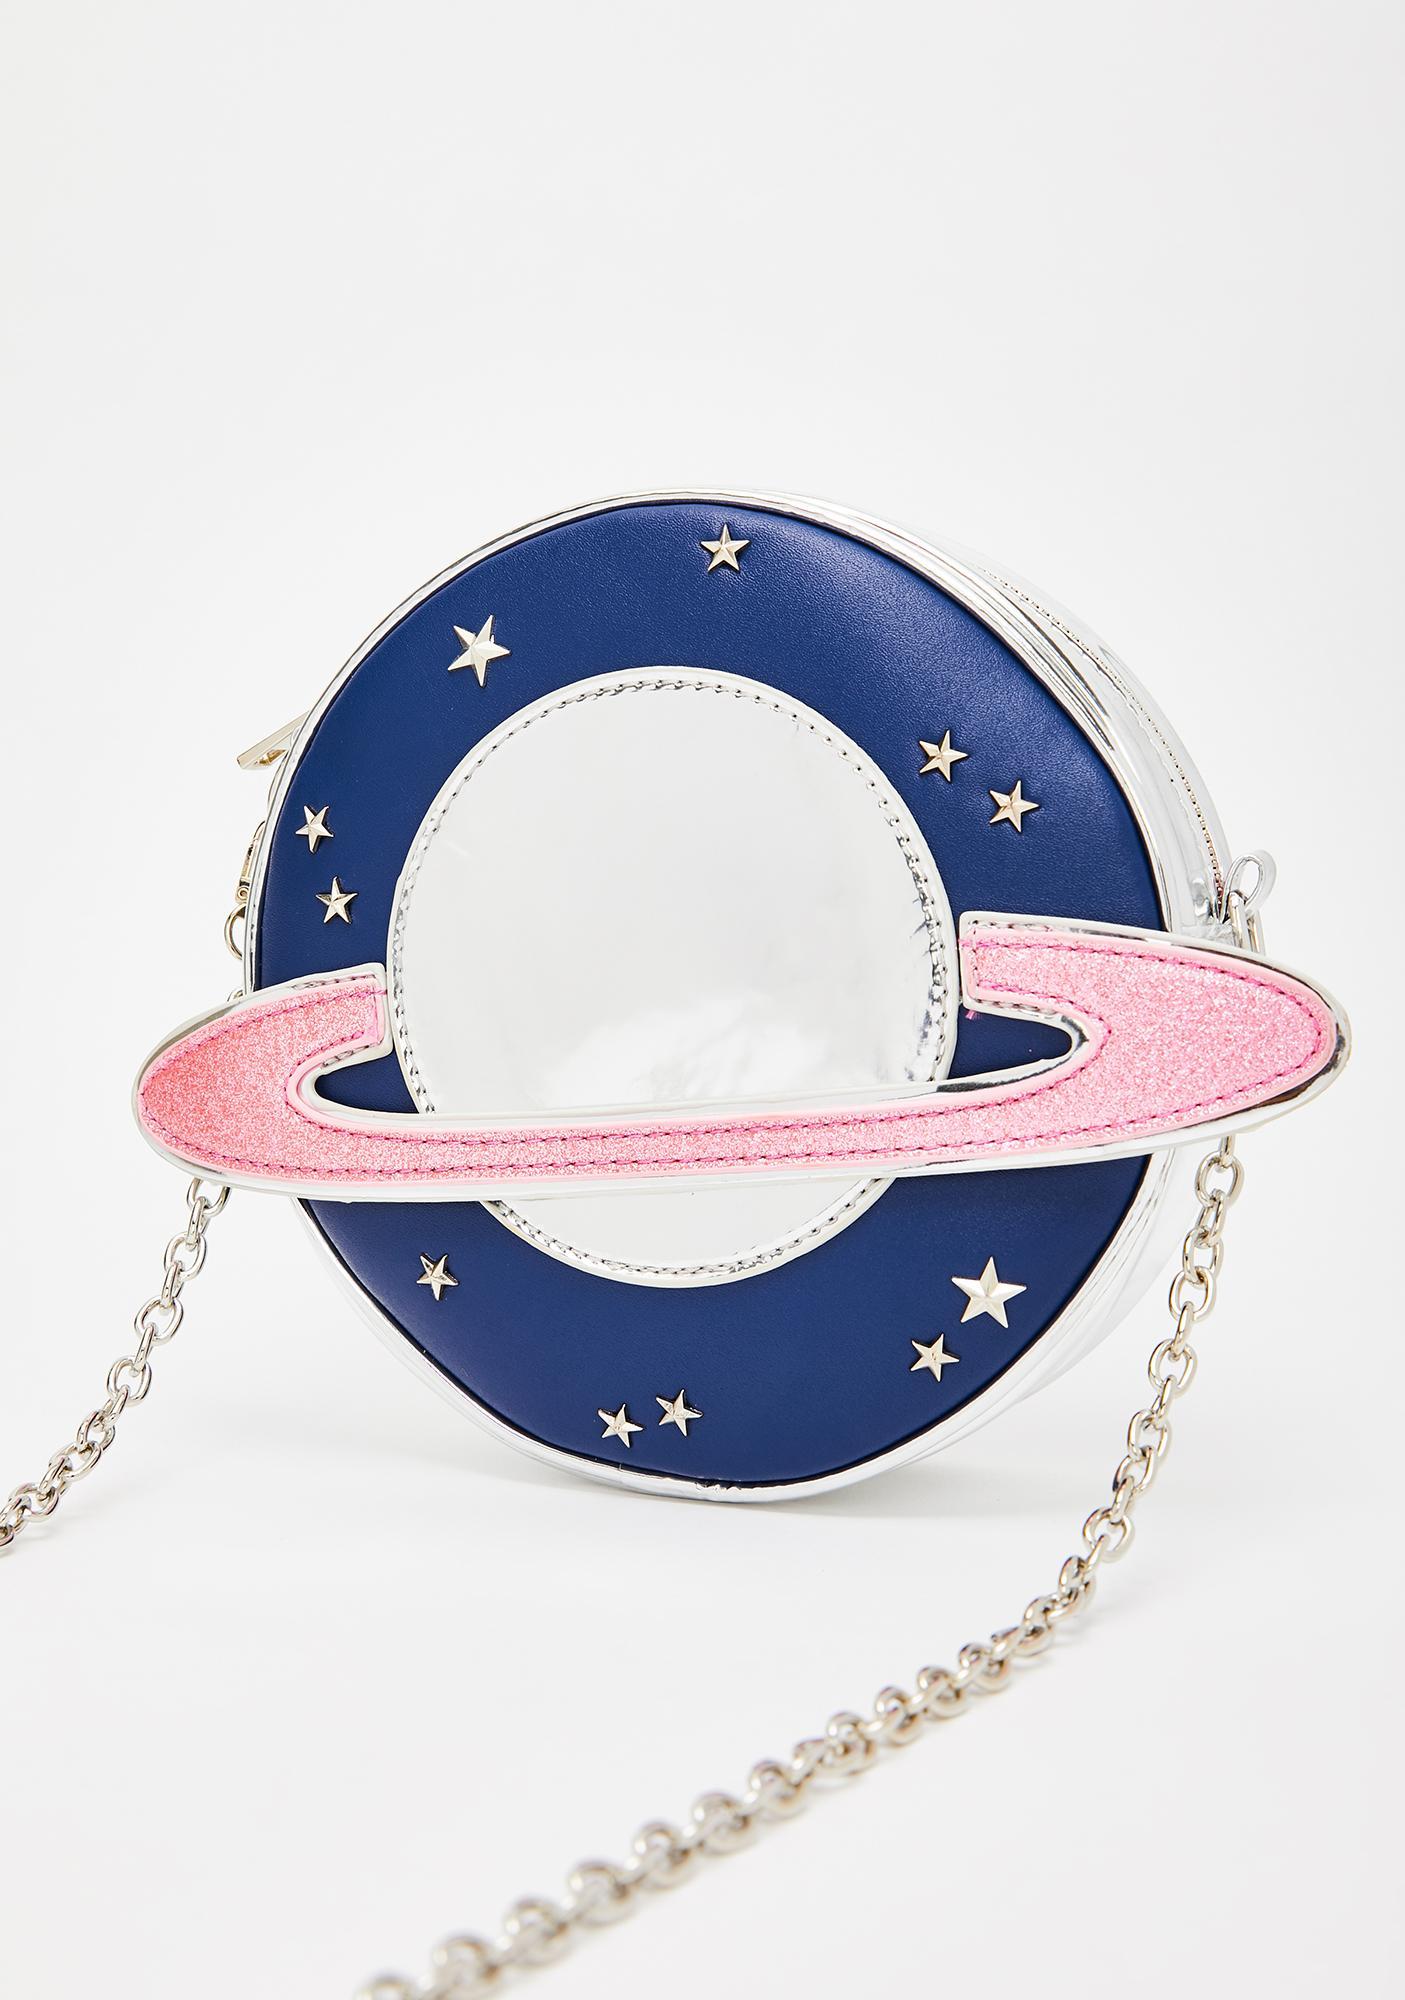 HOROSCOPEZ Rings Of Saturn Crossbody Bag